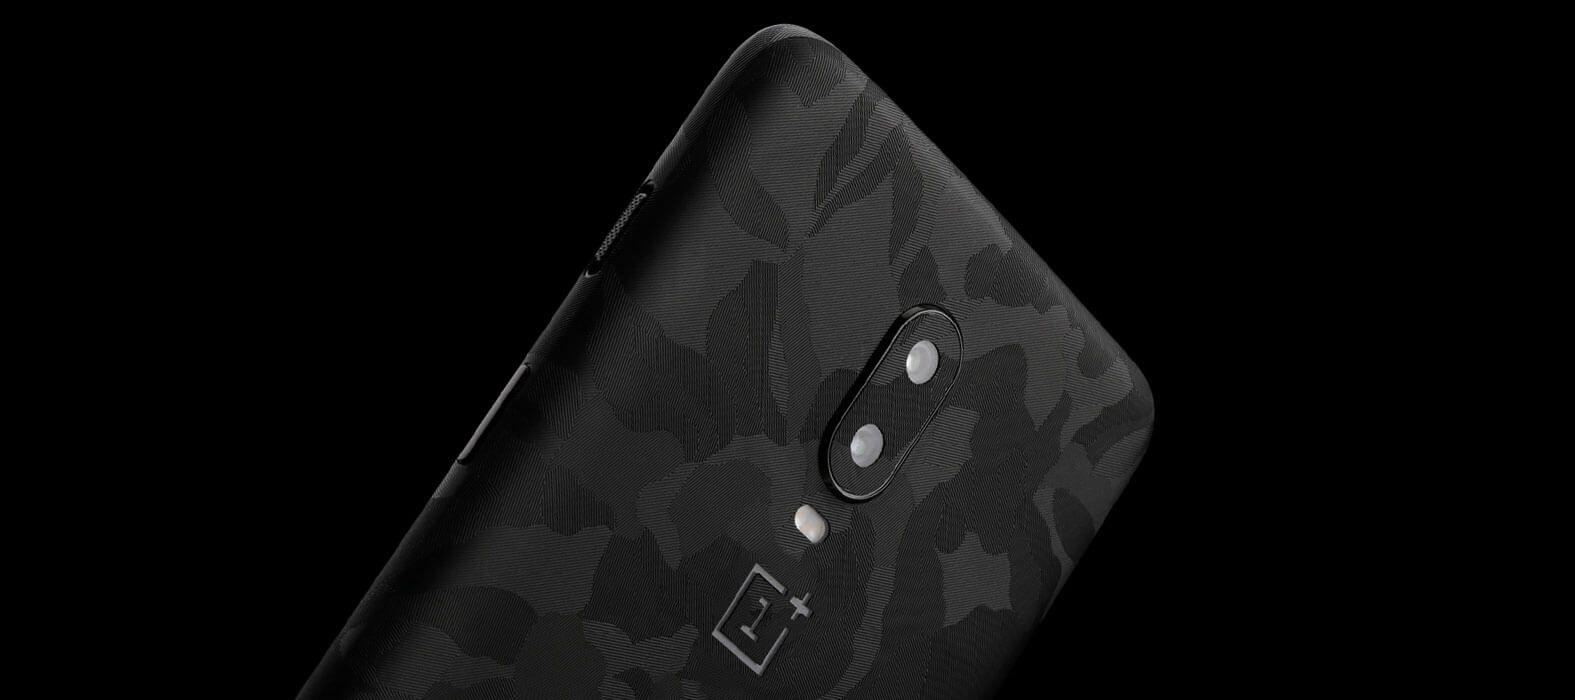 OnePlus 6T Black Camo Skins